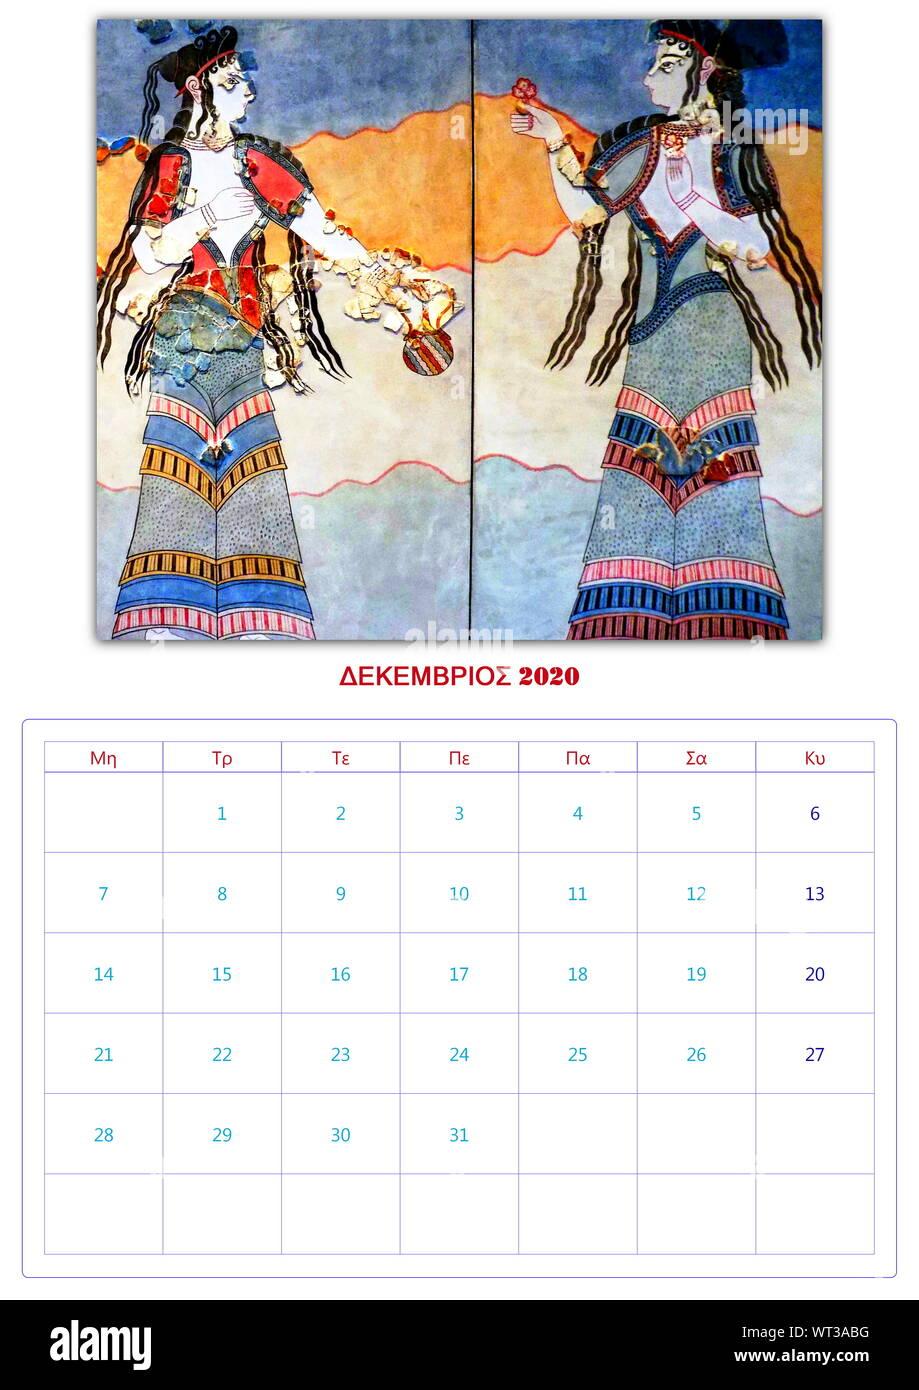 calendar, 2020, per month, 12 photos, fresco, ancient, Greek, Minoic, Mycenaean, collection 1 Stock Photo